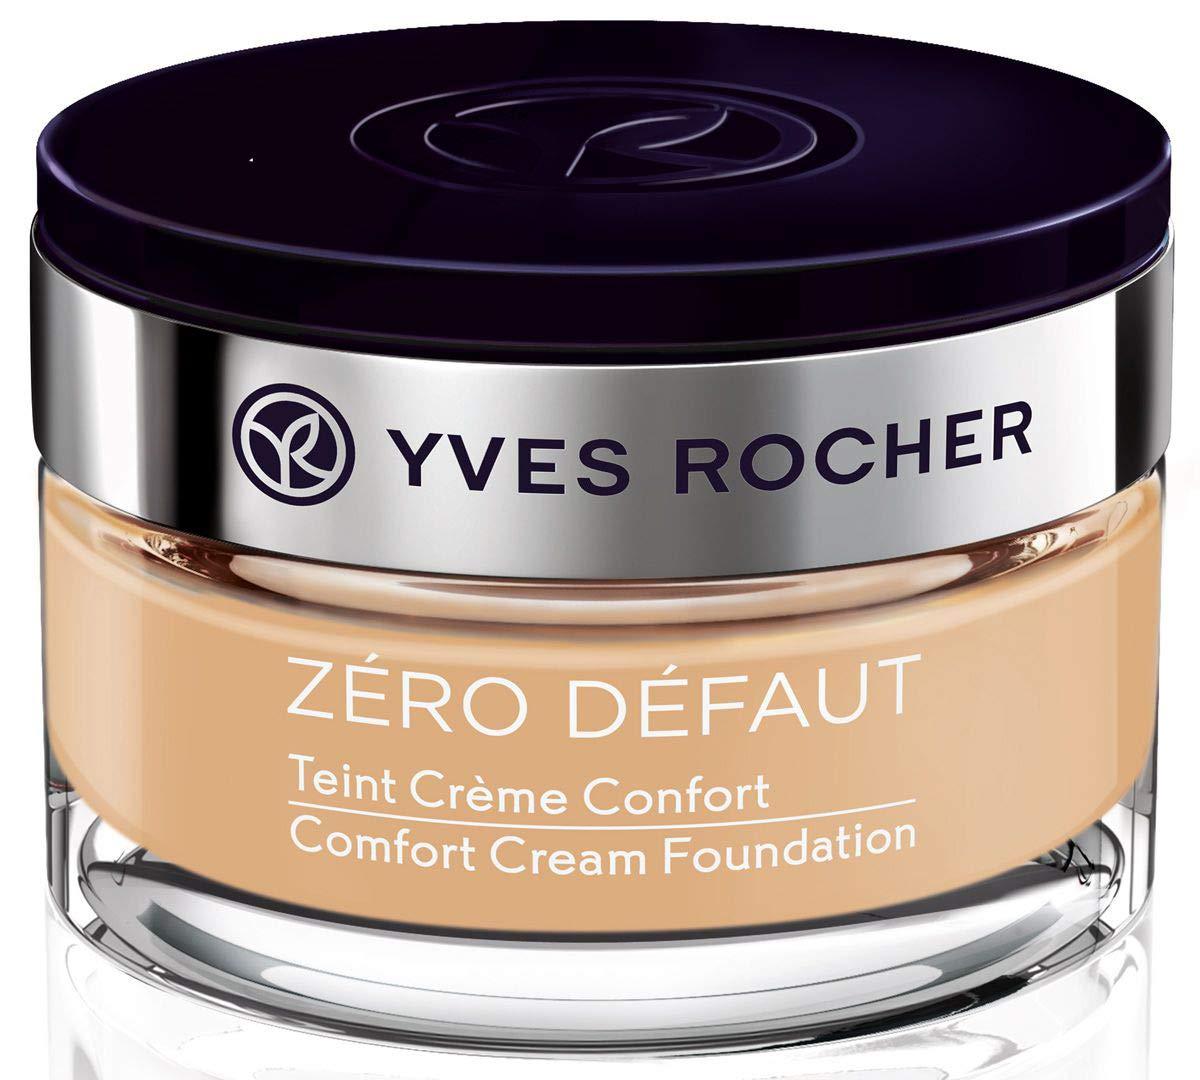 Yves Rocher Couleurs Nature Zero defaut Comfort Cream Foundation, 40 ml./1.35 fl.oz. (Beige 100)